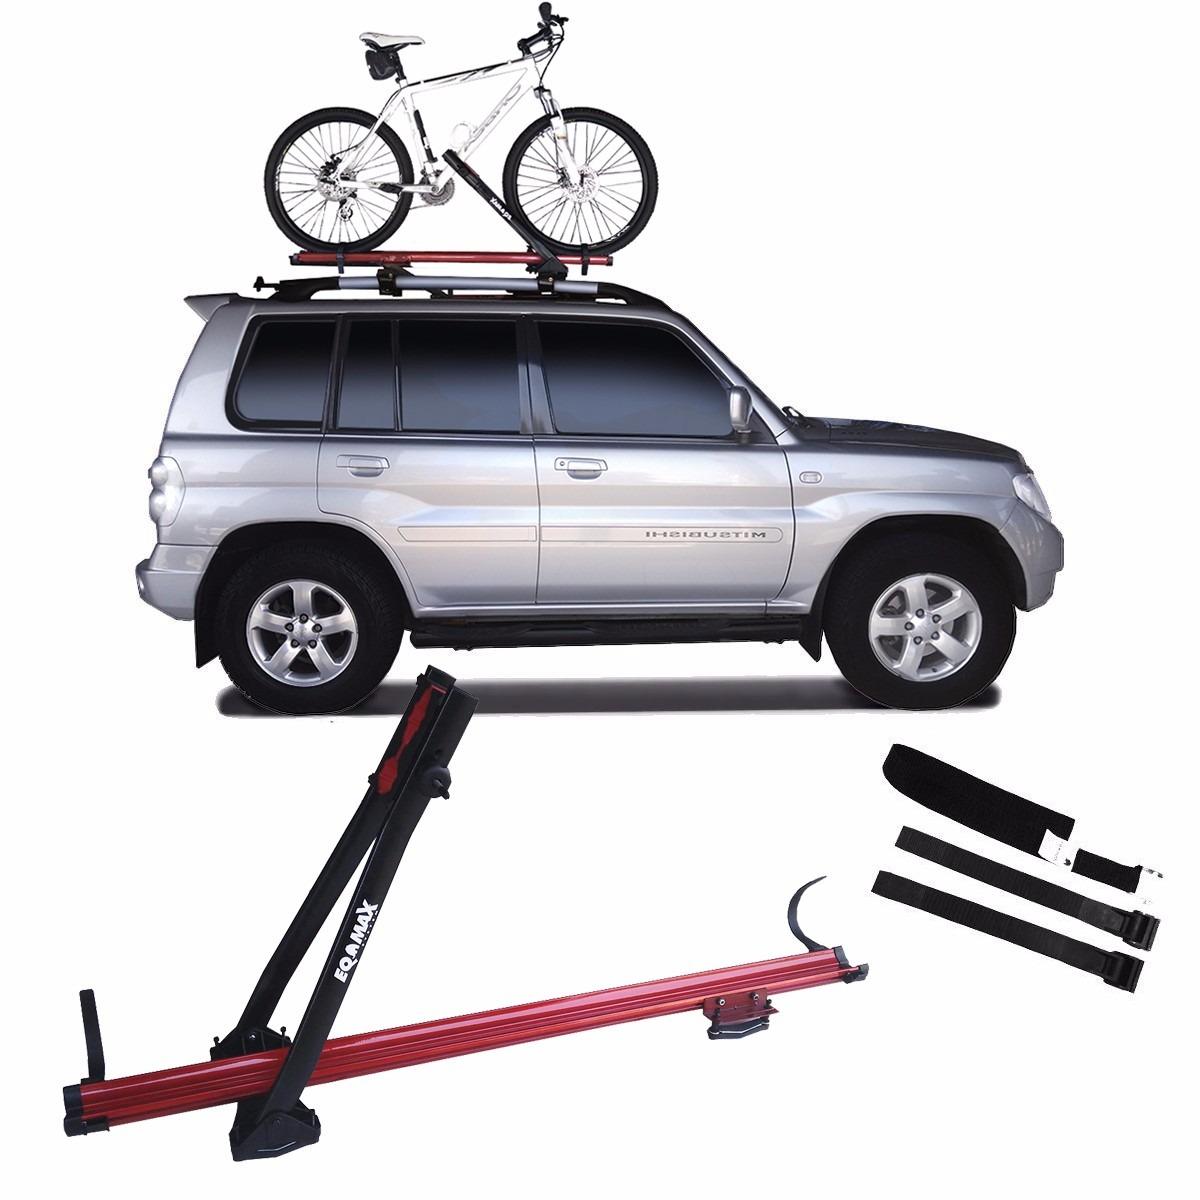 60d6dd608 rack transbike teto calha bike eqmax velox alumínio vermelho. Carregando  zoom.